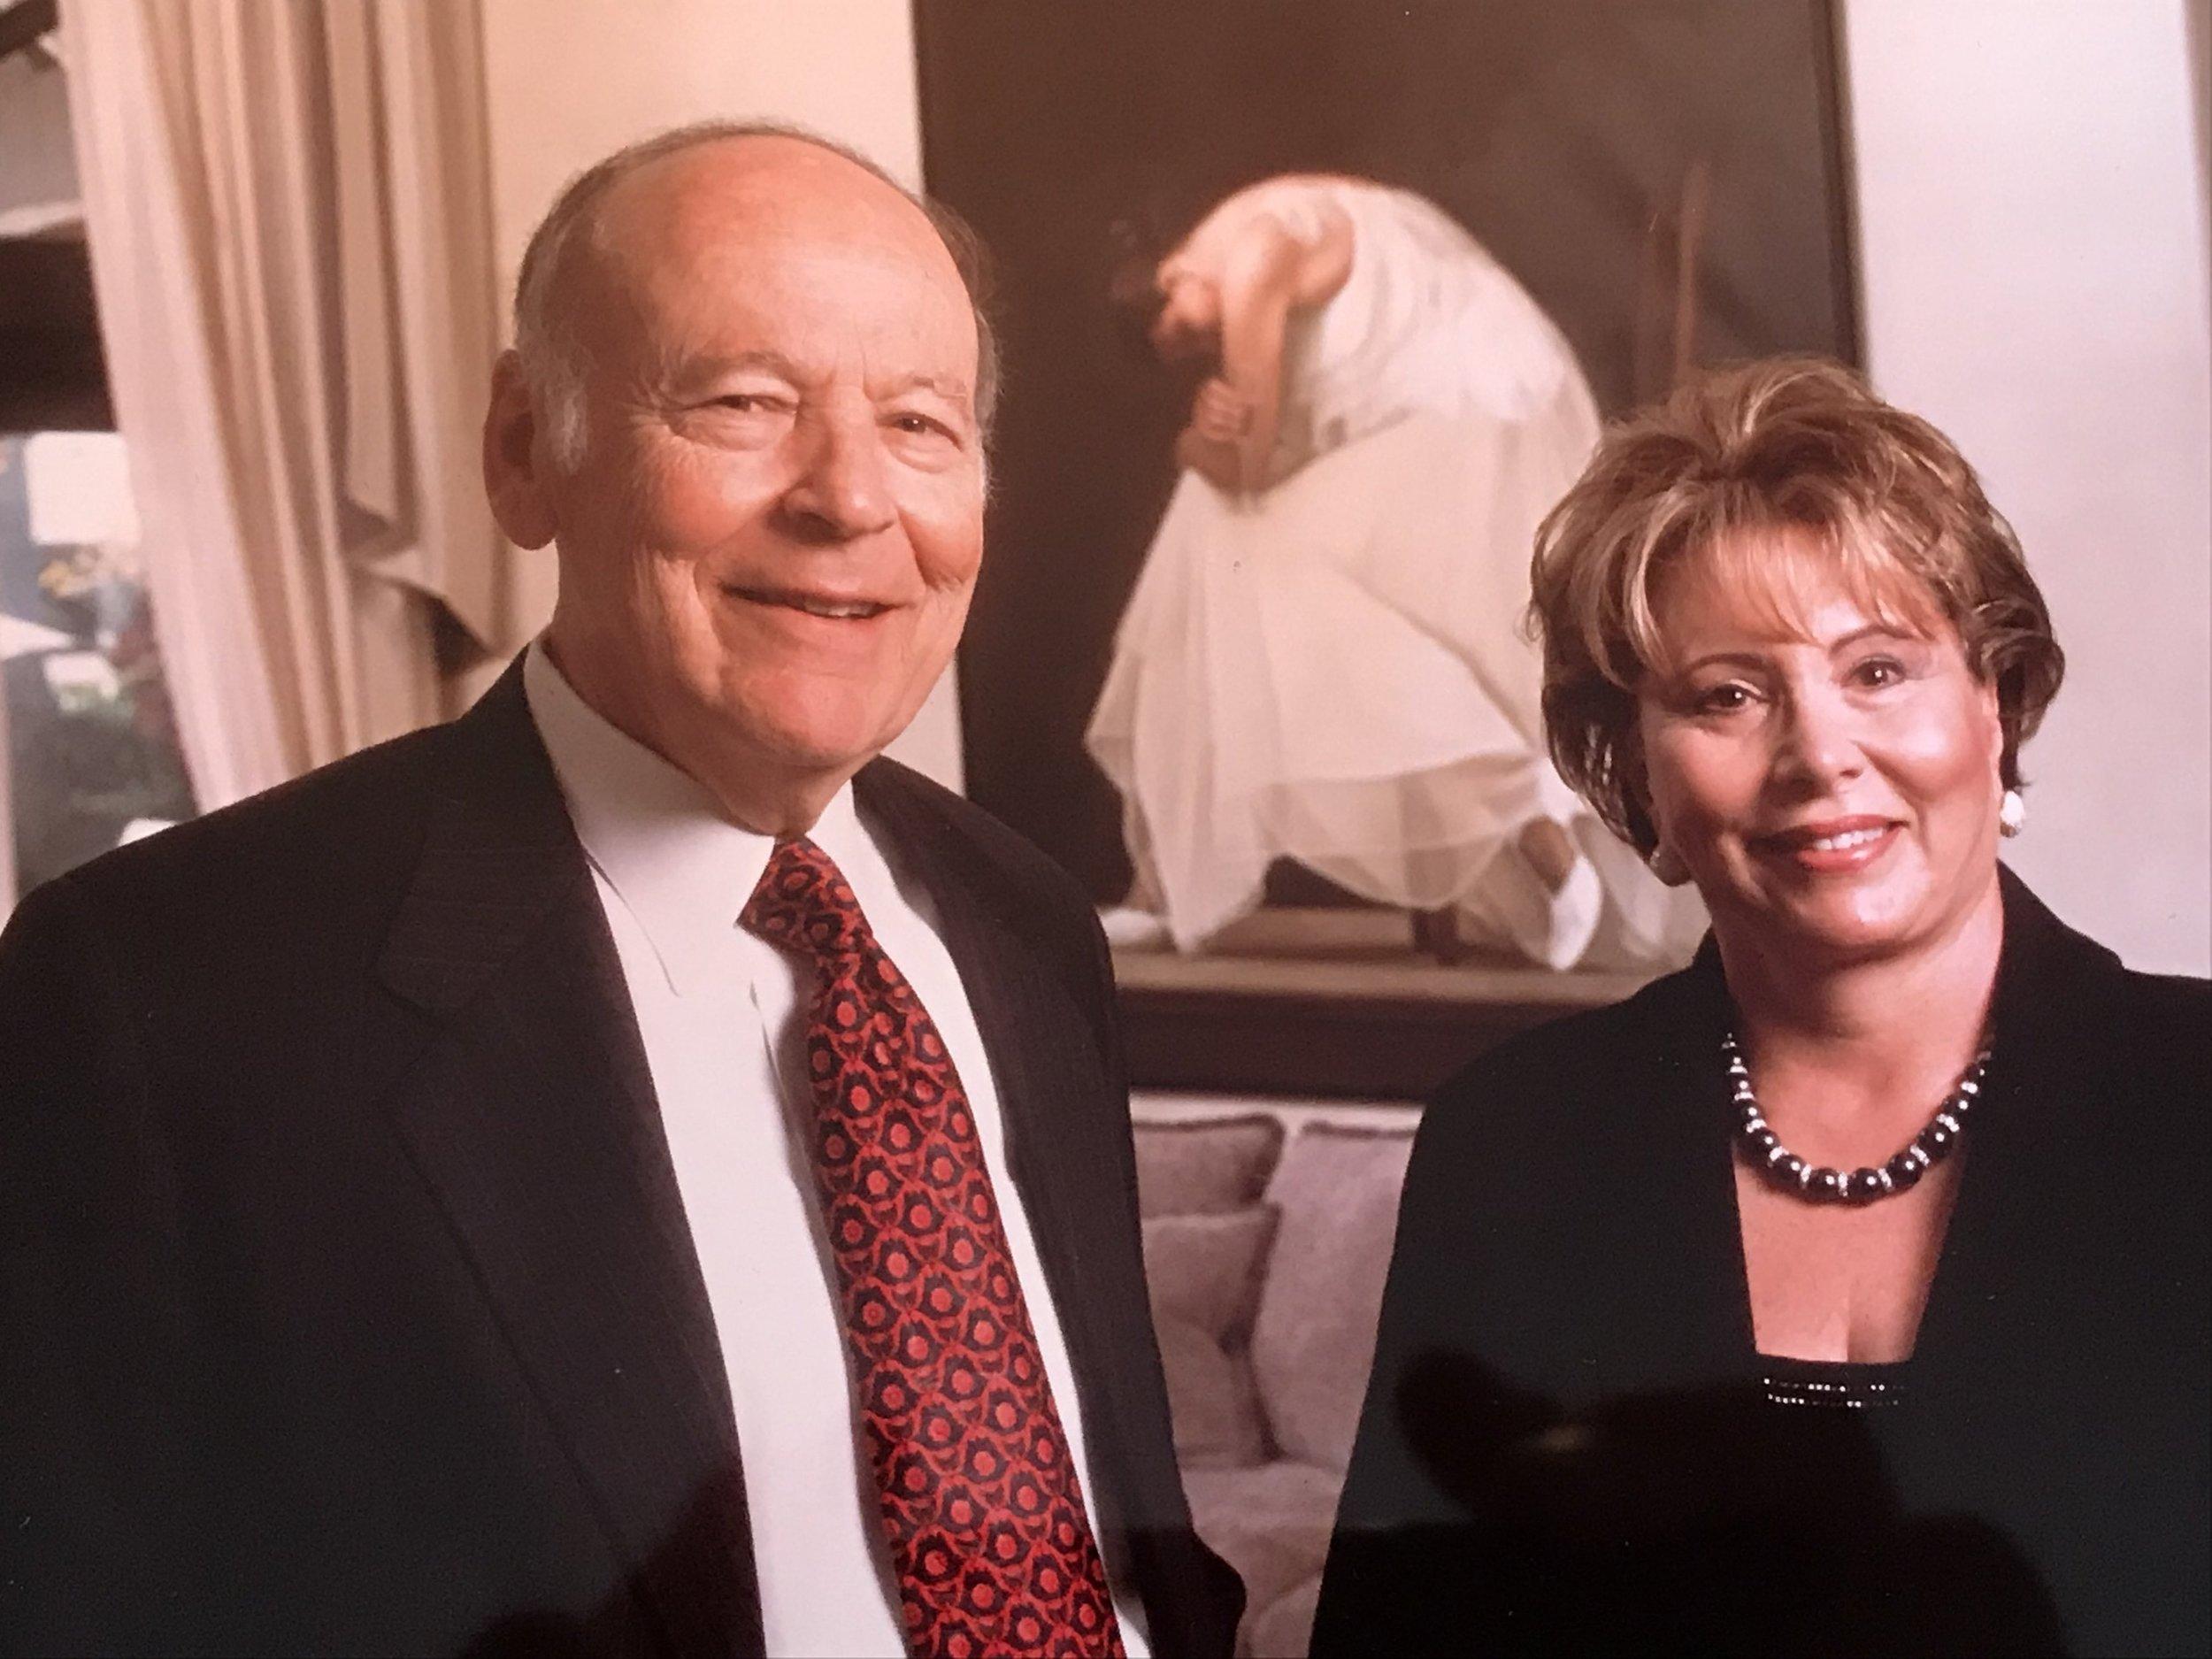 Randall Kaplan's parents,Leonard and Tobee Kaplan